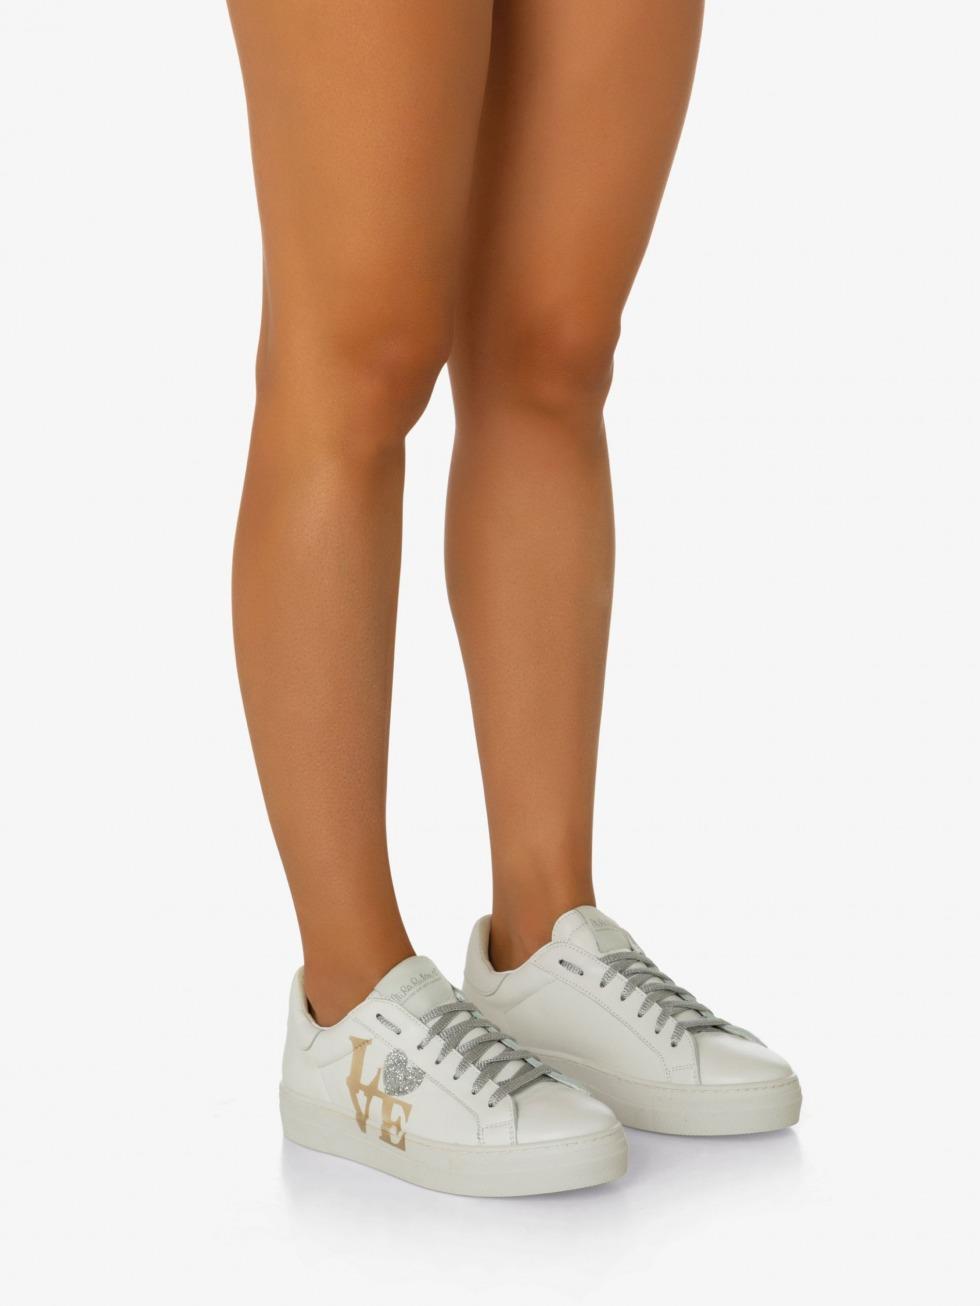 Martini White Sneakers - Platinum Love